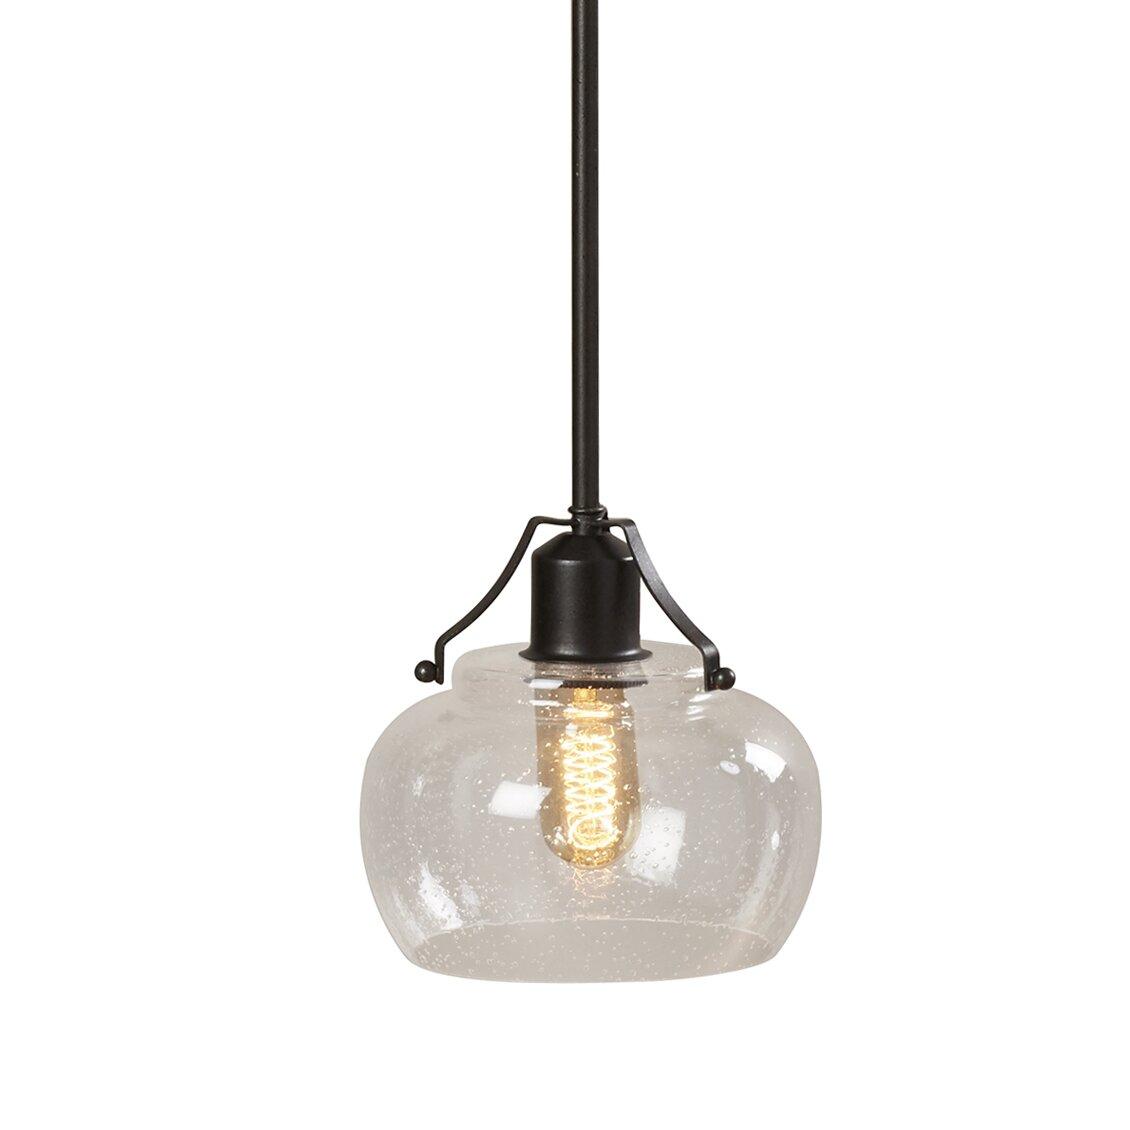 Trent austin design wabanaki 1 light mini pendant for Wayfair industrial lamp